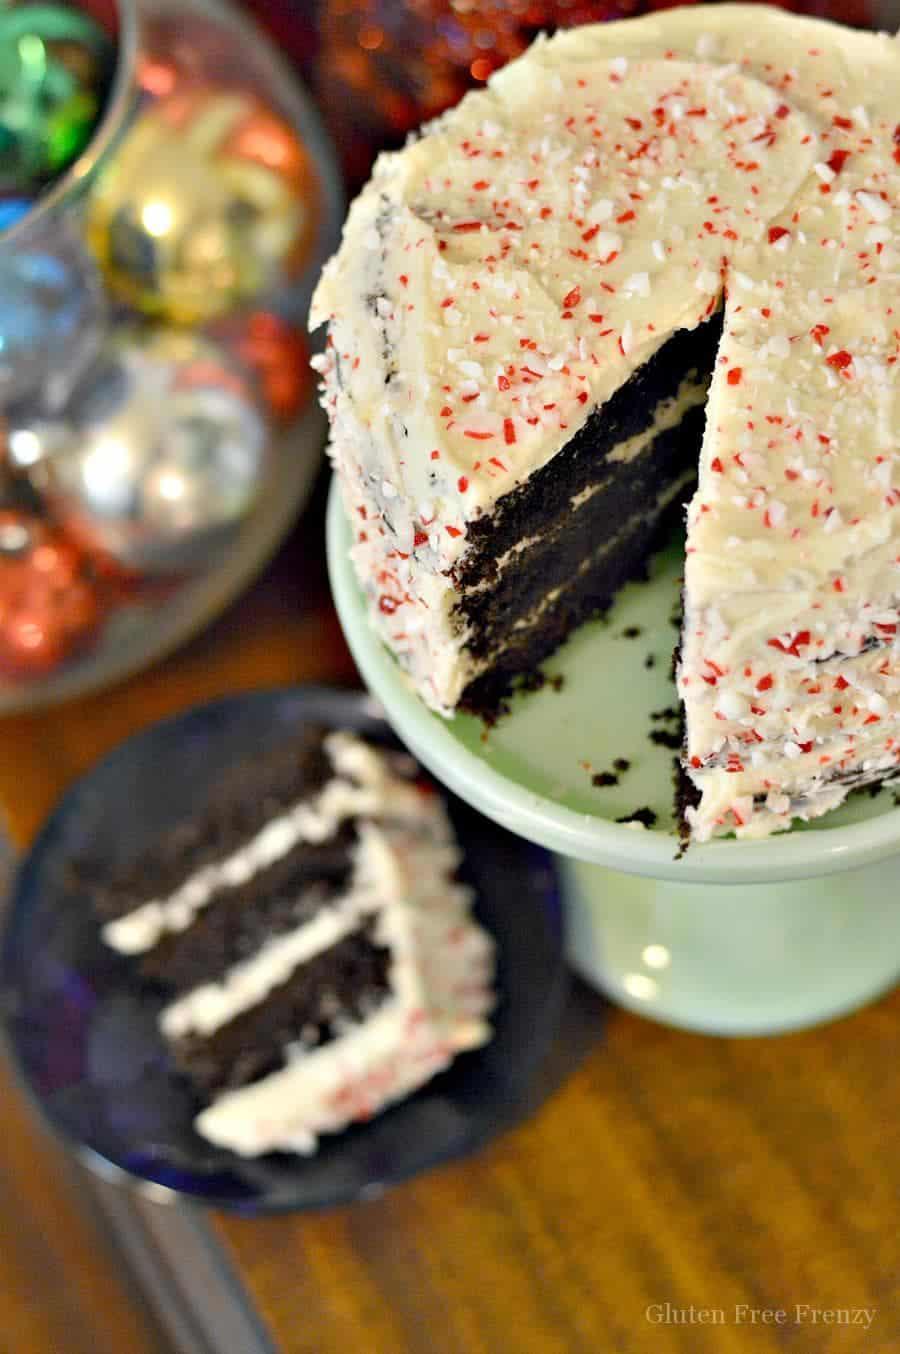 Paleo Peppermint Chocolate Cake